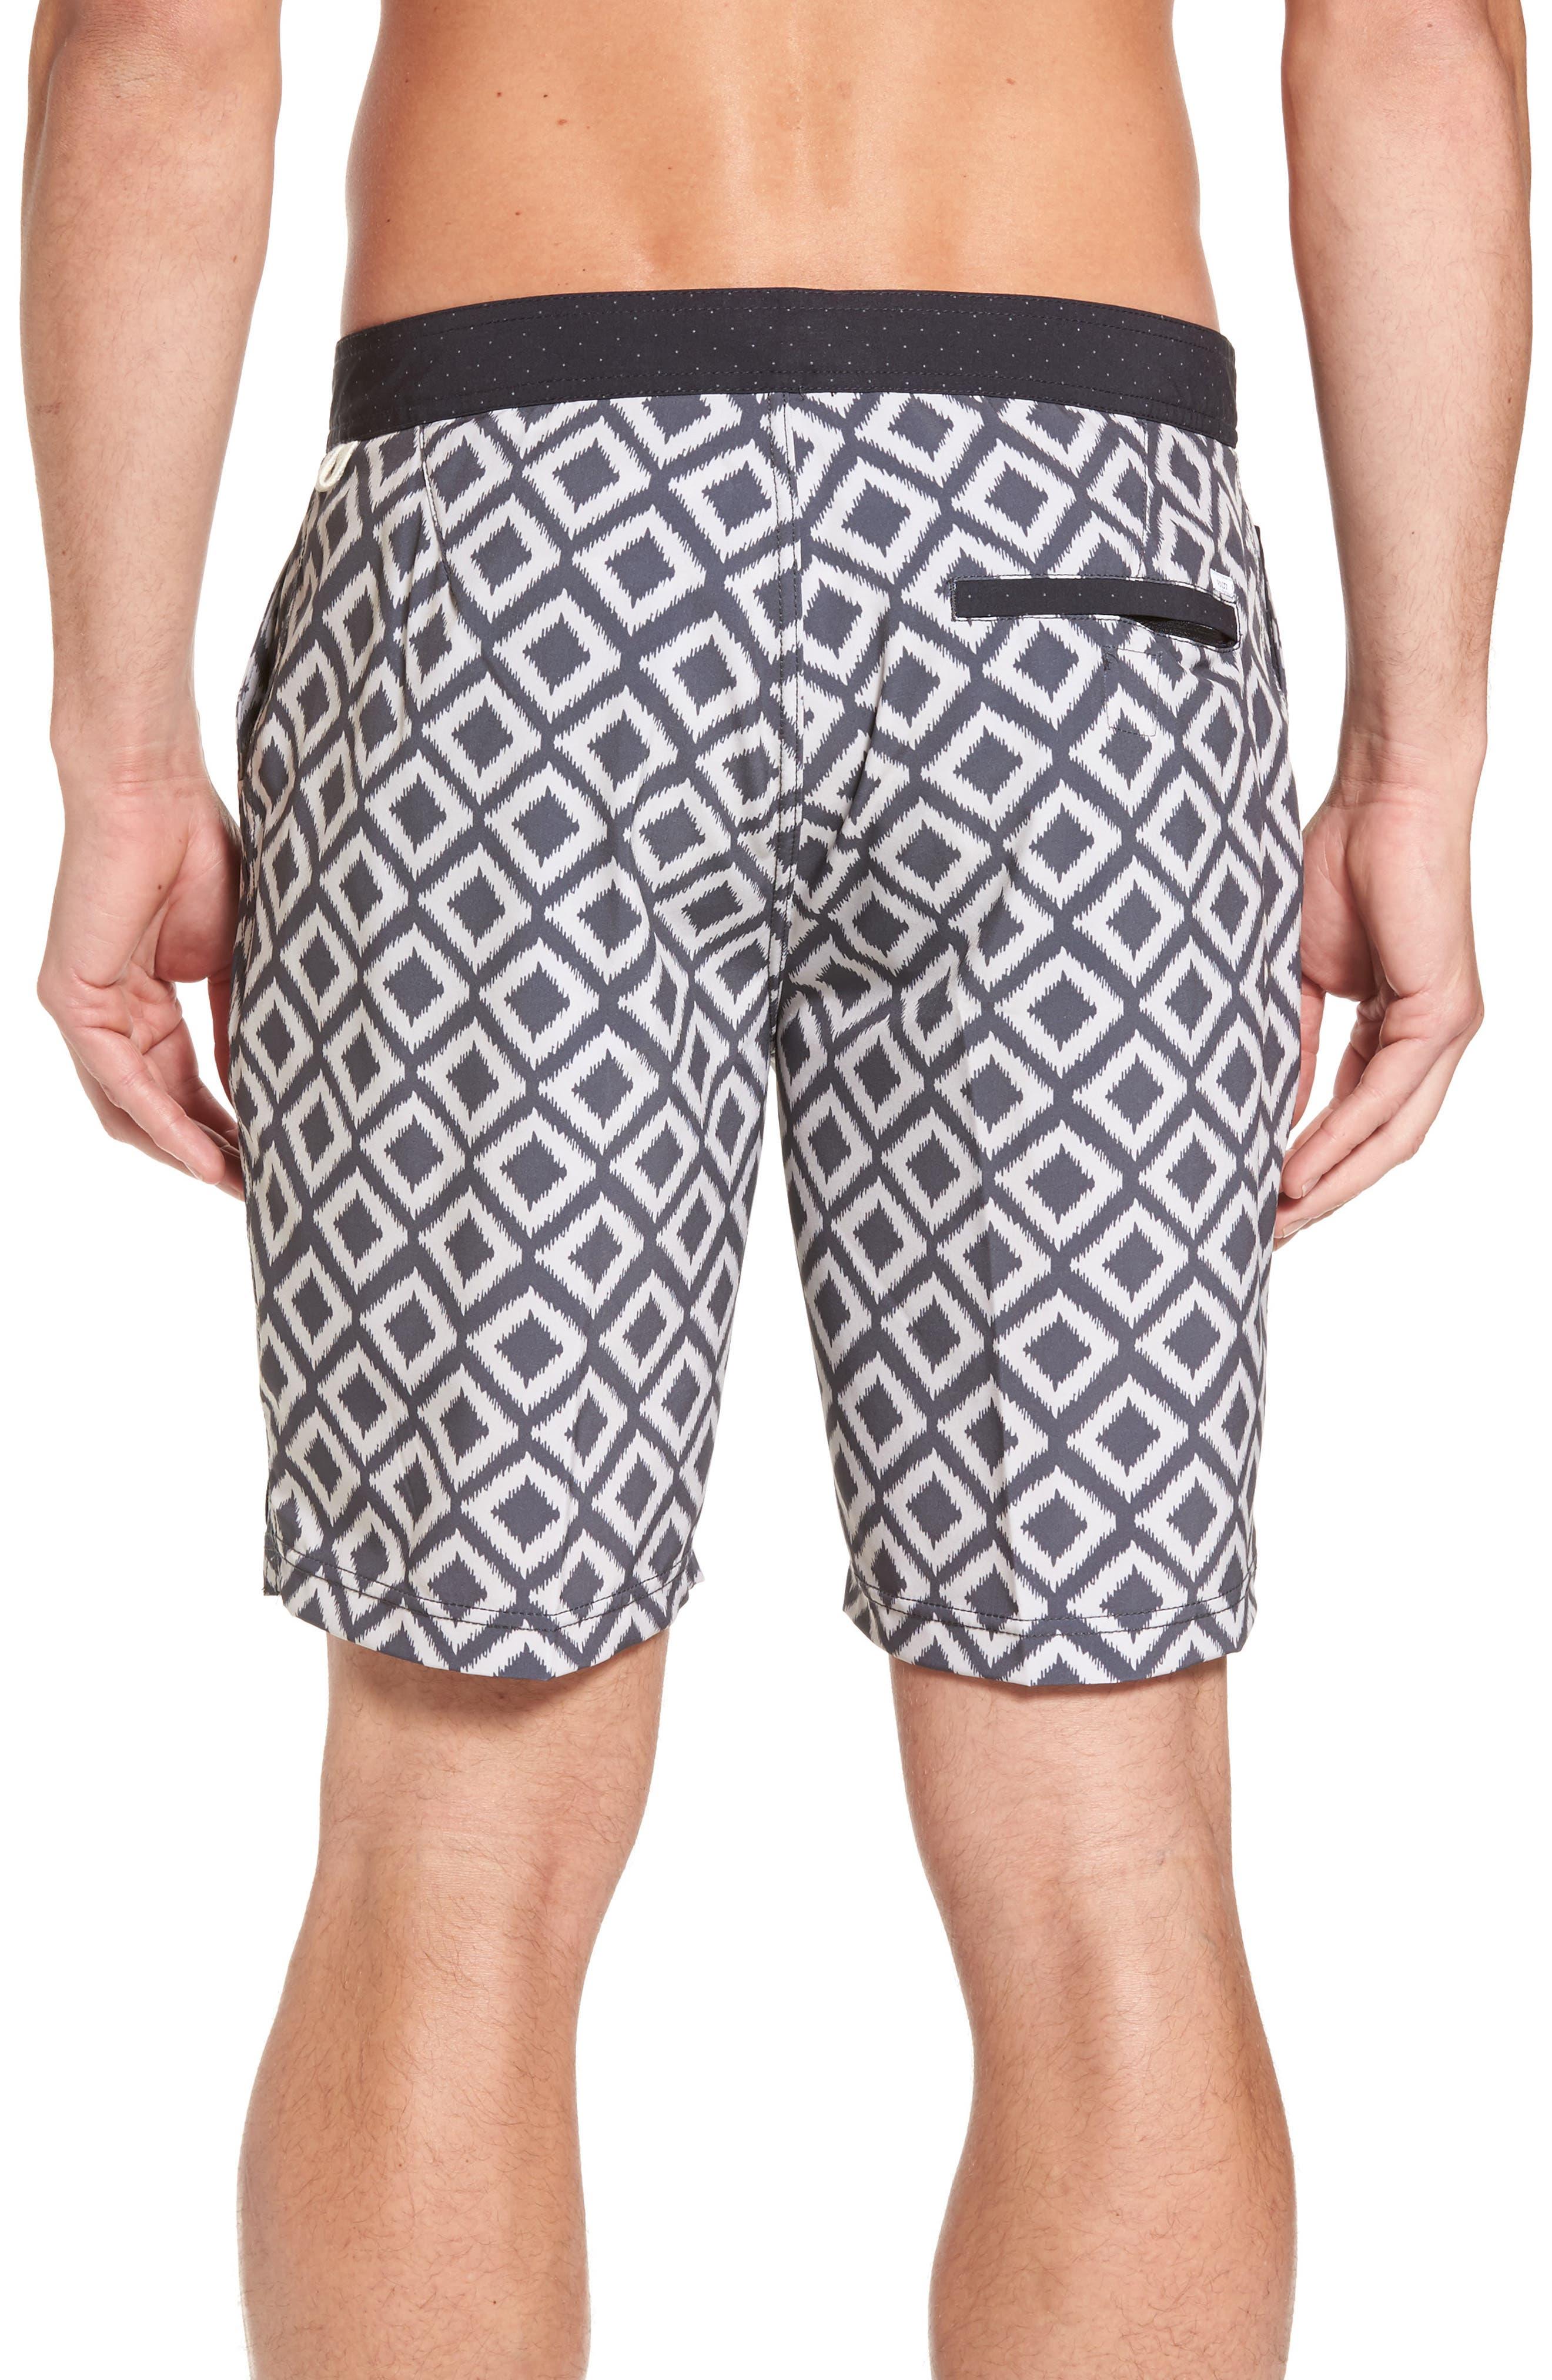 Equator Board Shorts,                             Alternate thumbnail 2, color,                             250